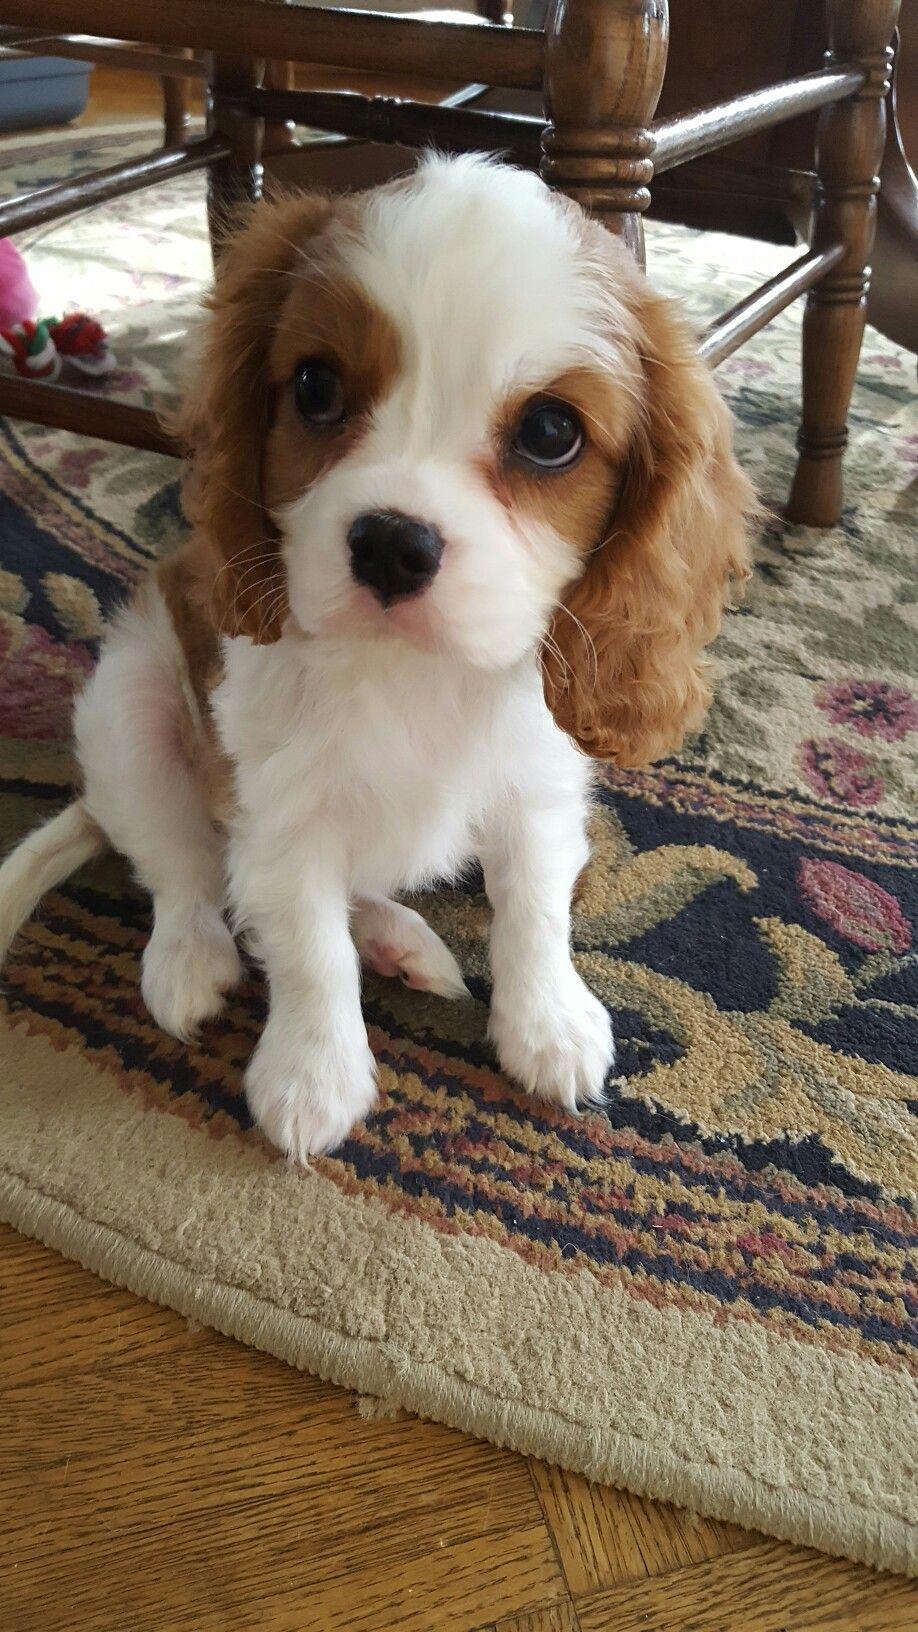 Pin By Nazarena Madera On Animals King Charles Cavalier Spaniel Puppy Dog Love Cavalier King Charles